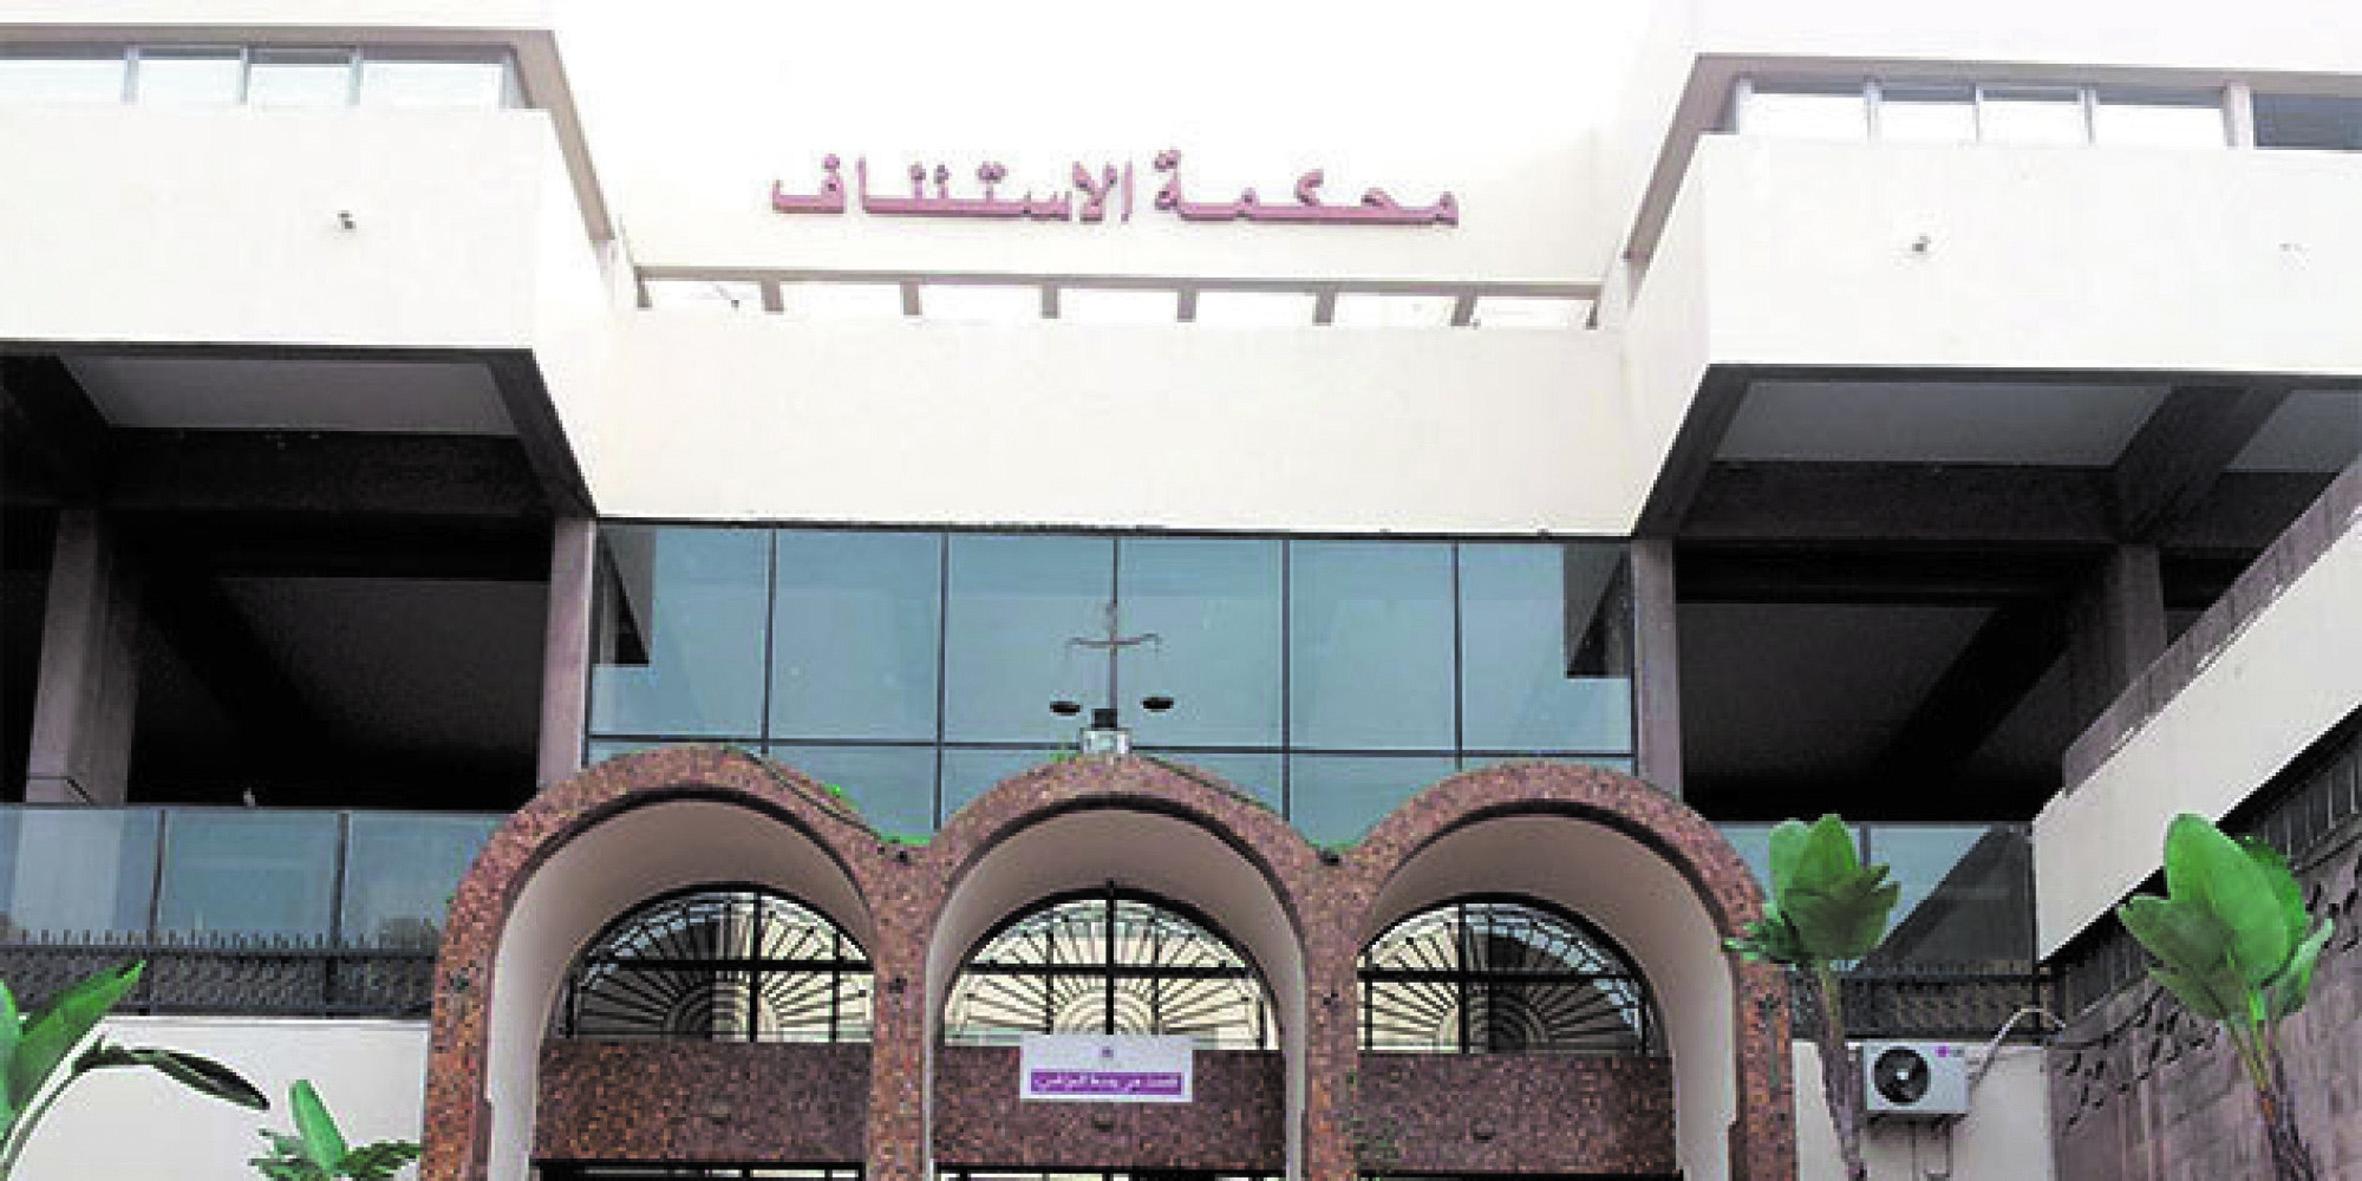 Début du procès de Nasser Zefzafi à Casablanca